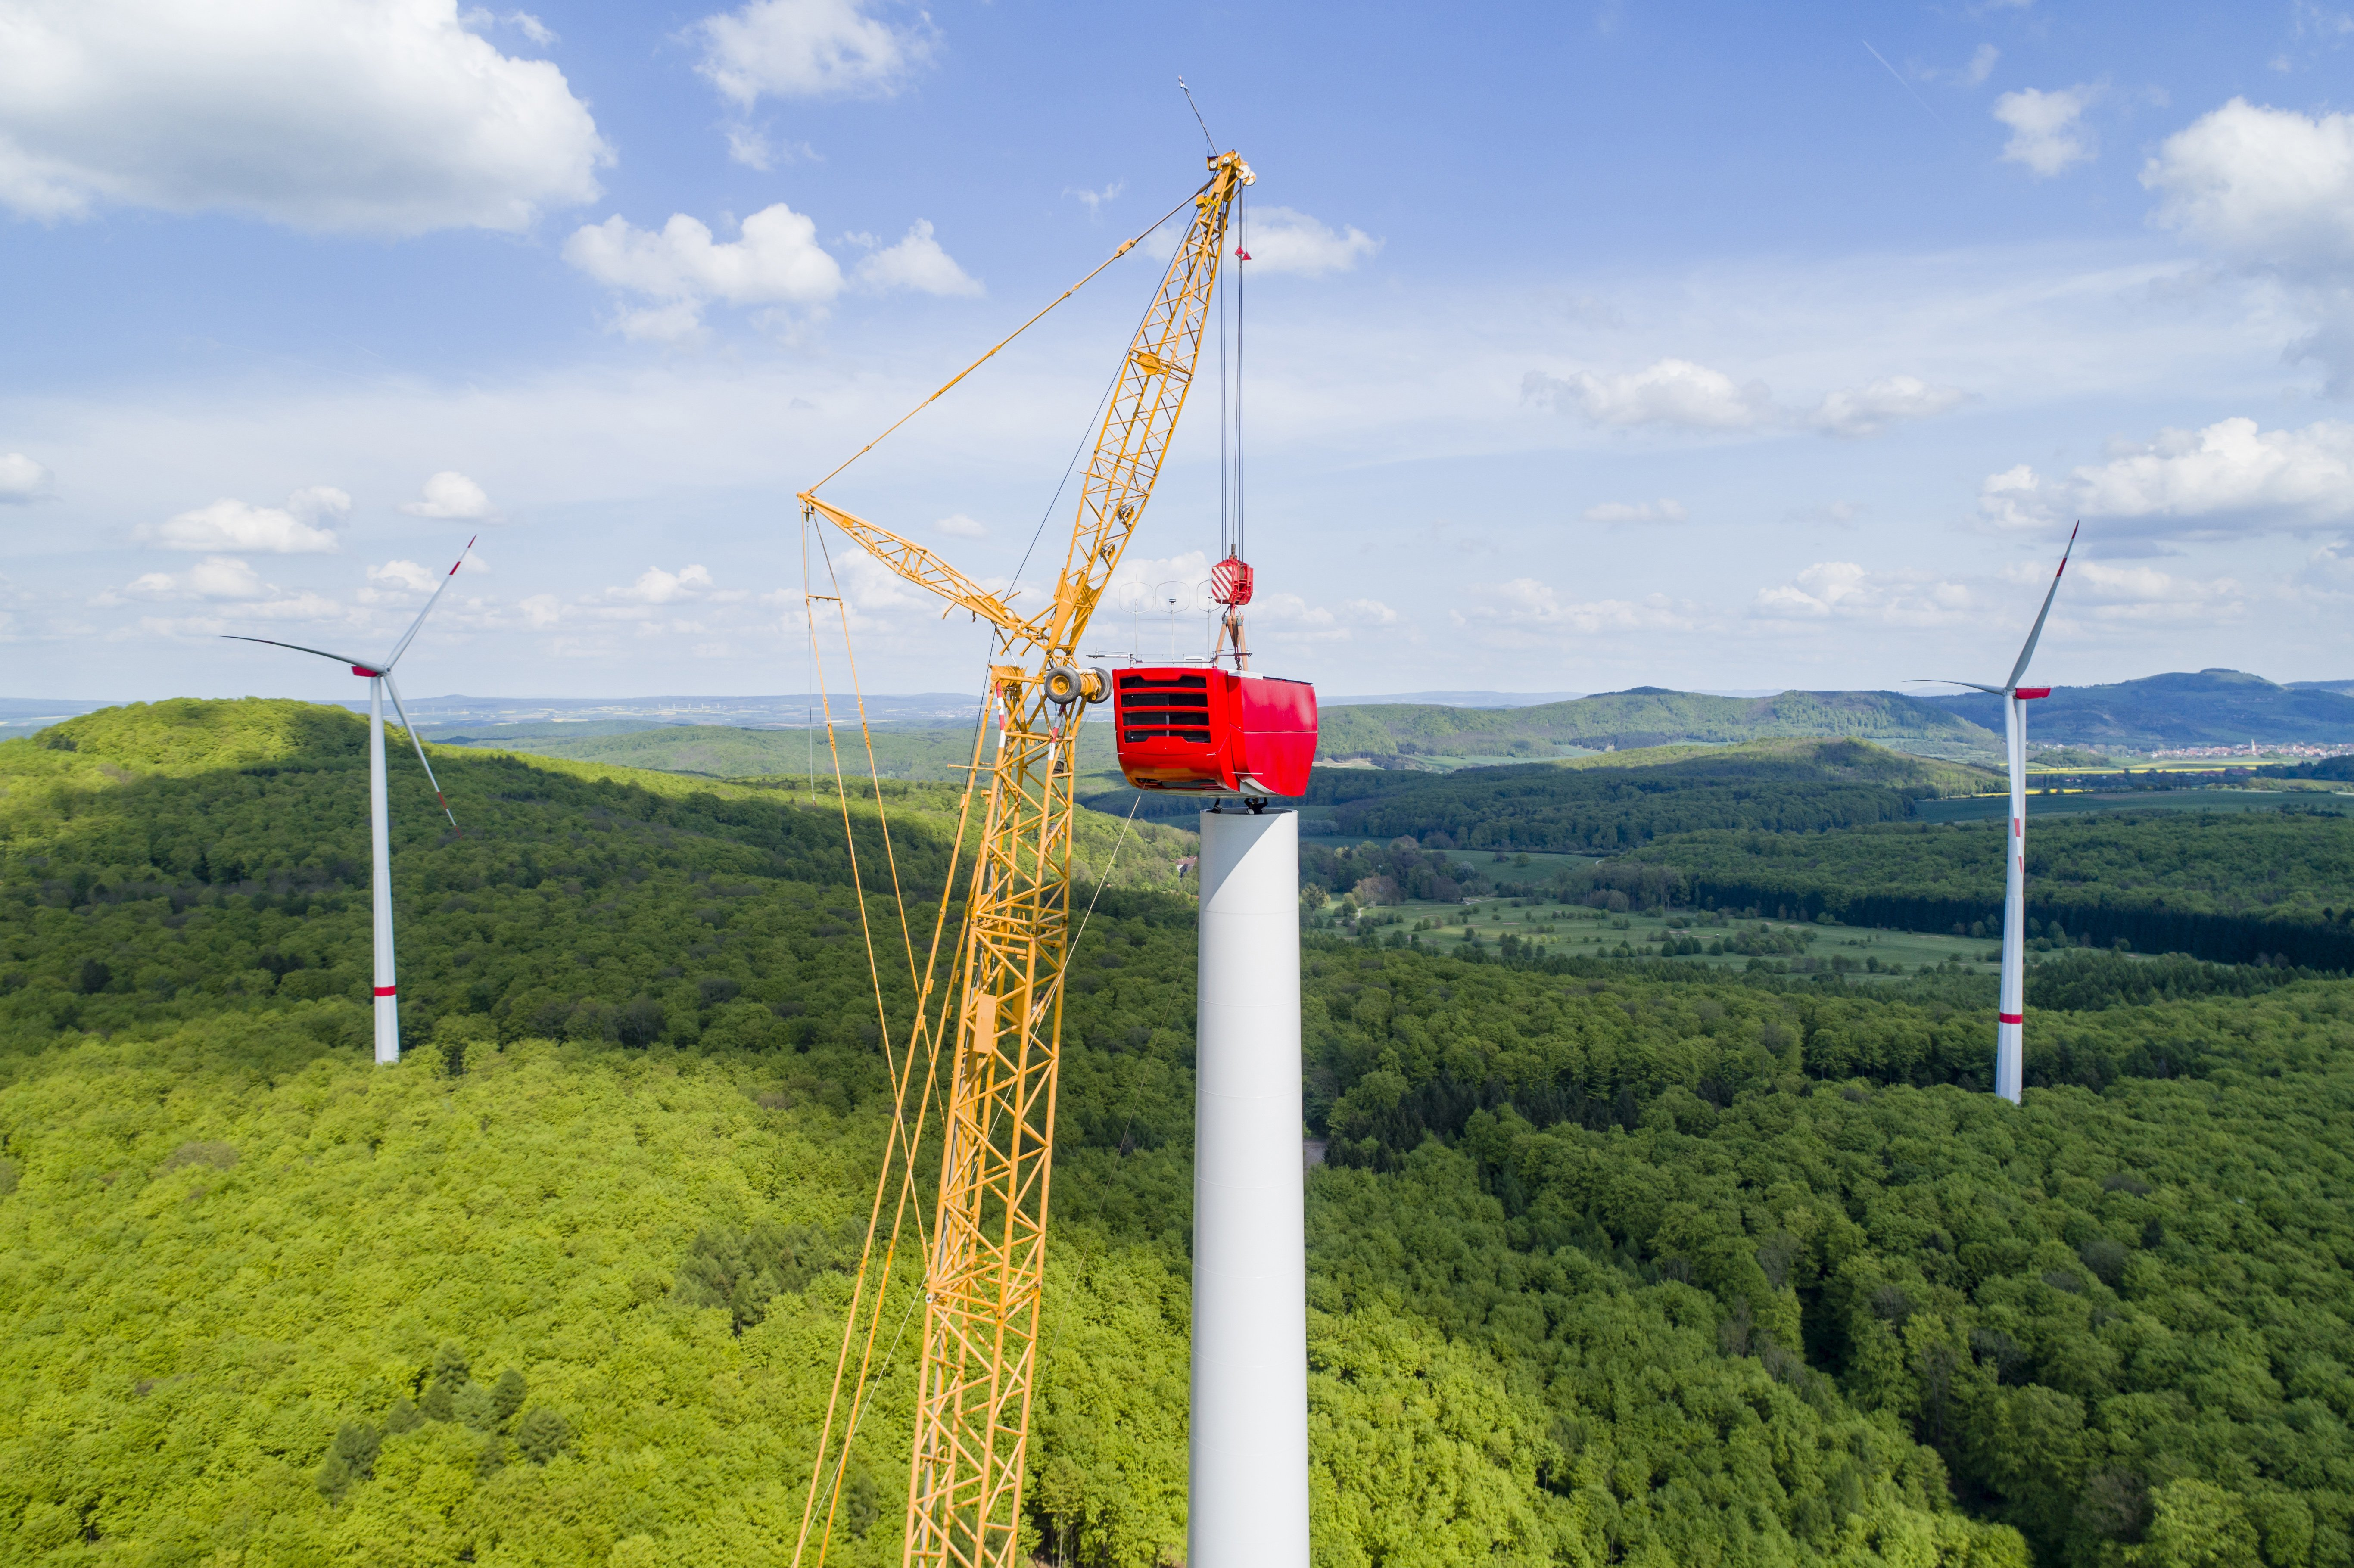 Aerial view of wind turbine under construction_659582905_shutterstock